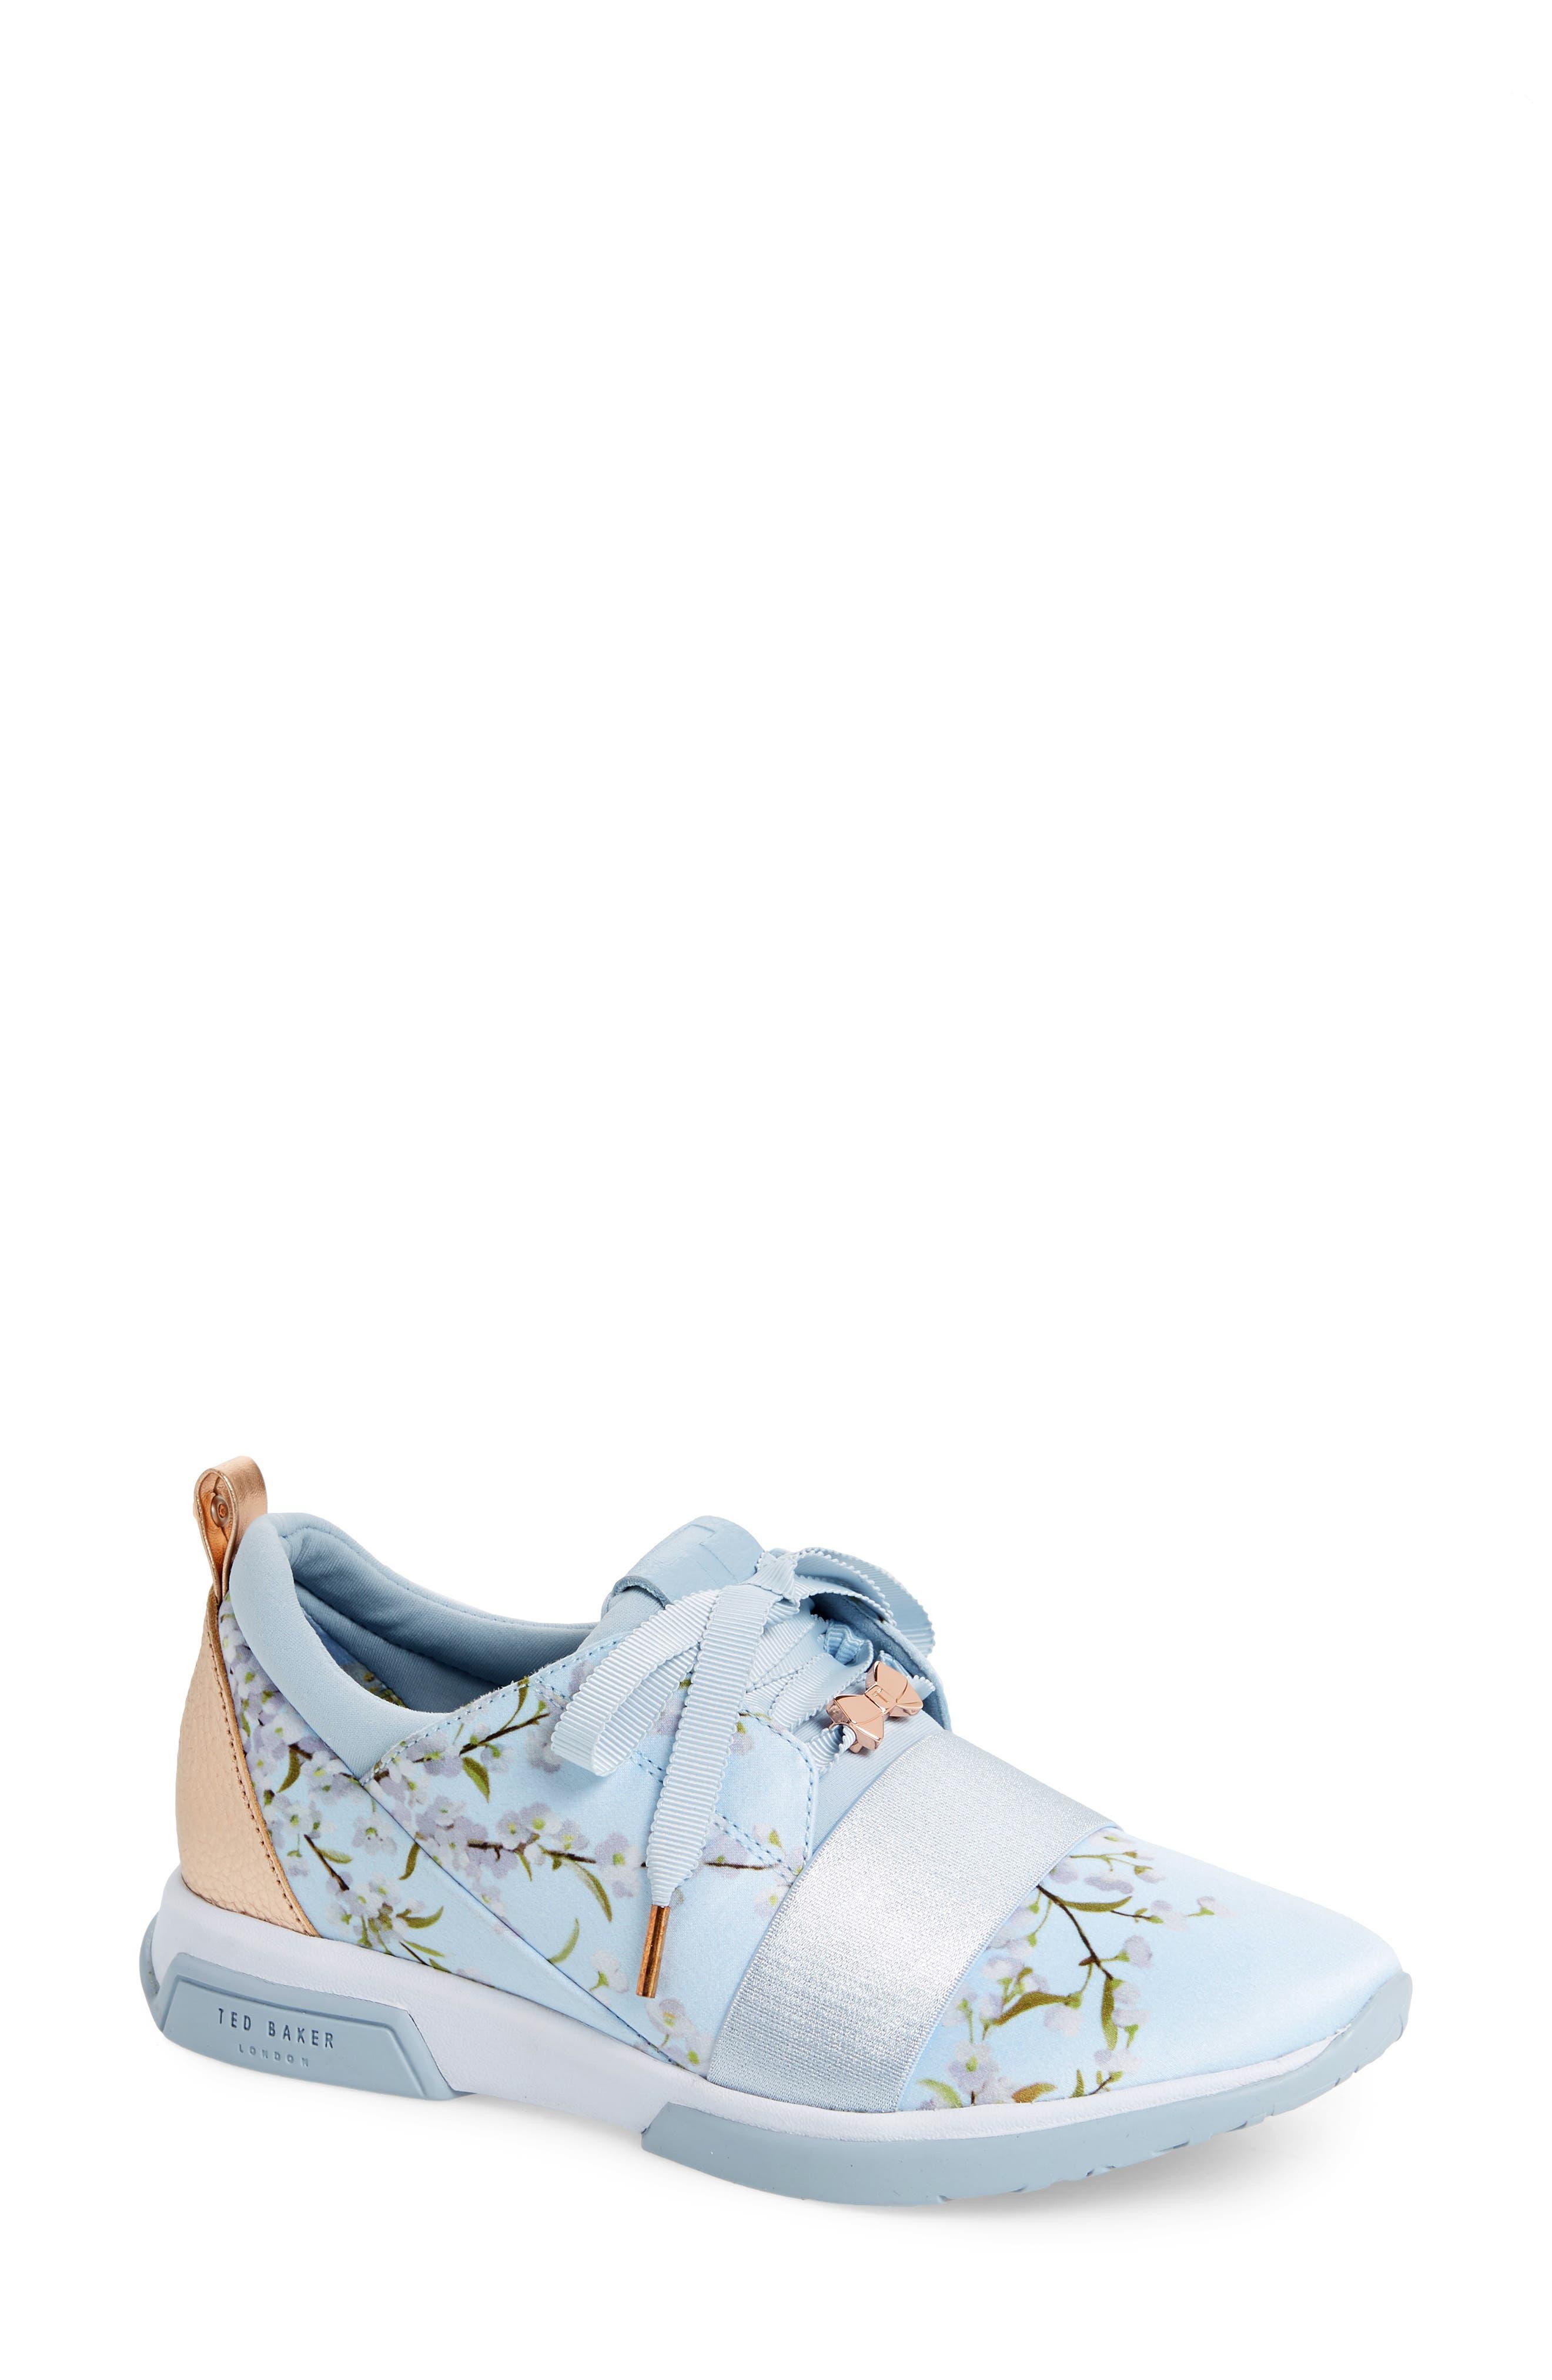 5d91d18b862041 Women s Ted Baker London Sneakers   Running Shoes